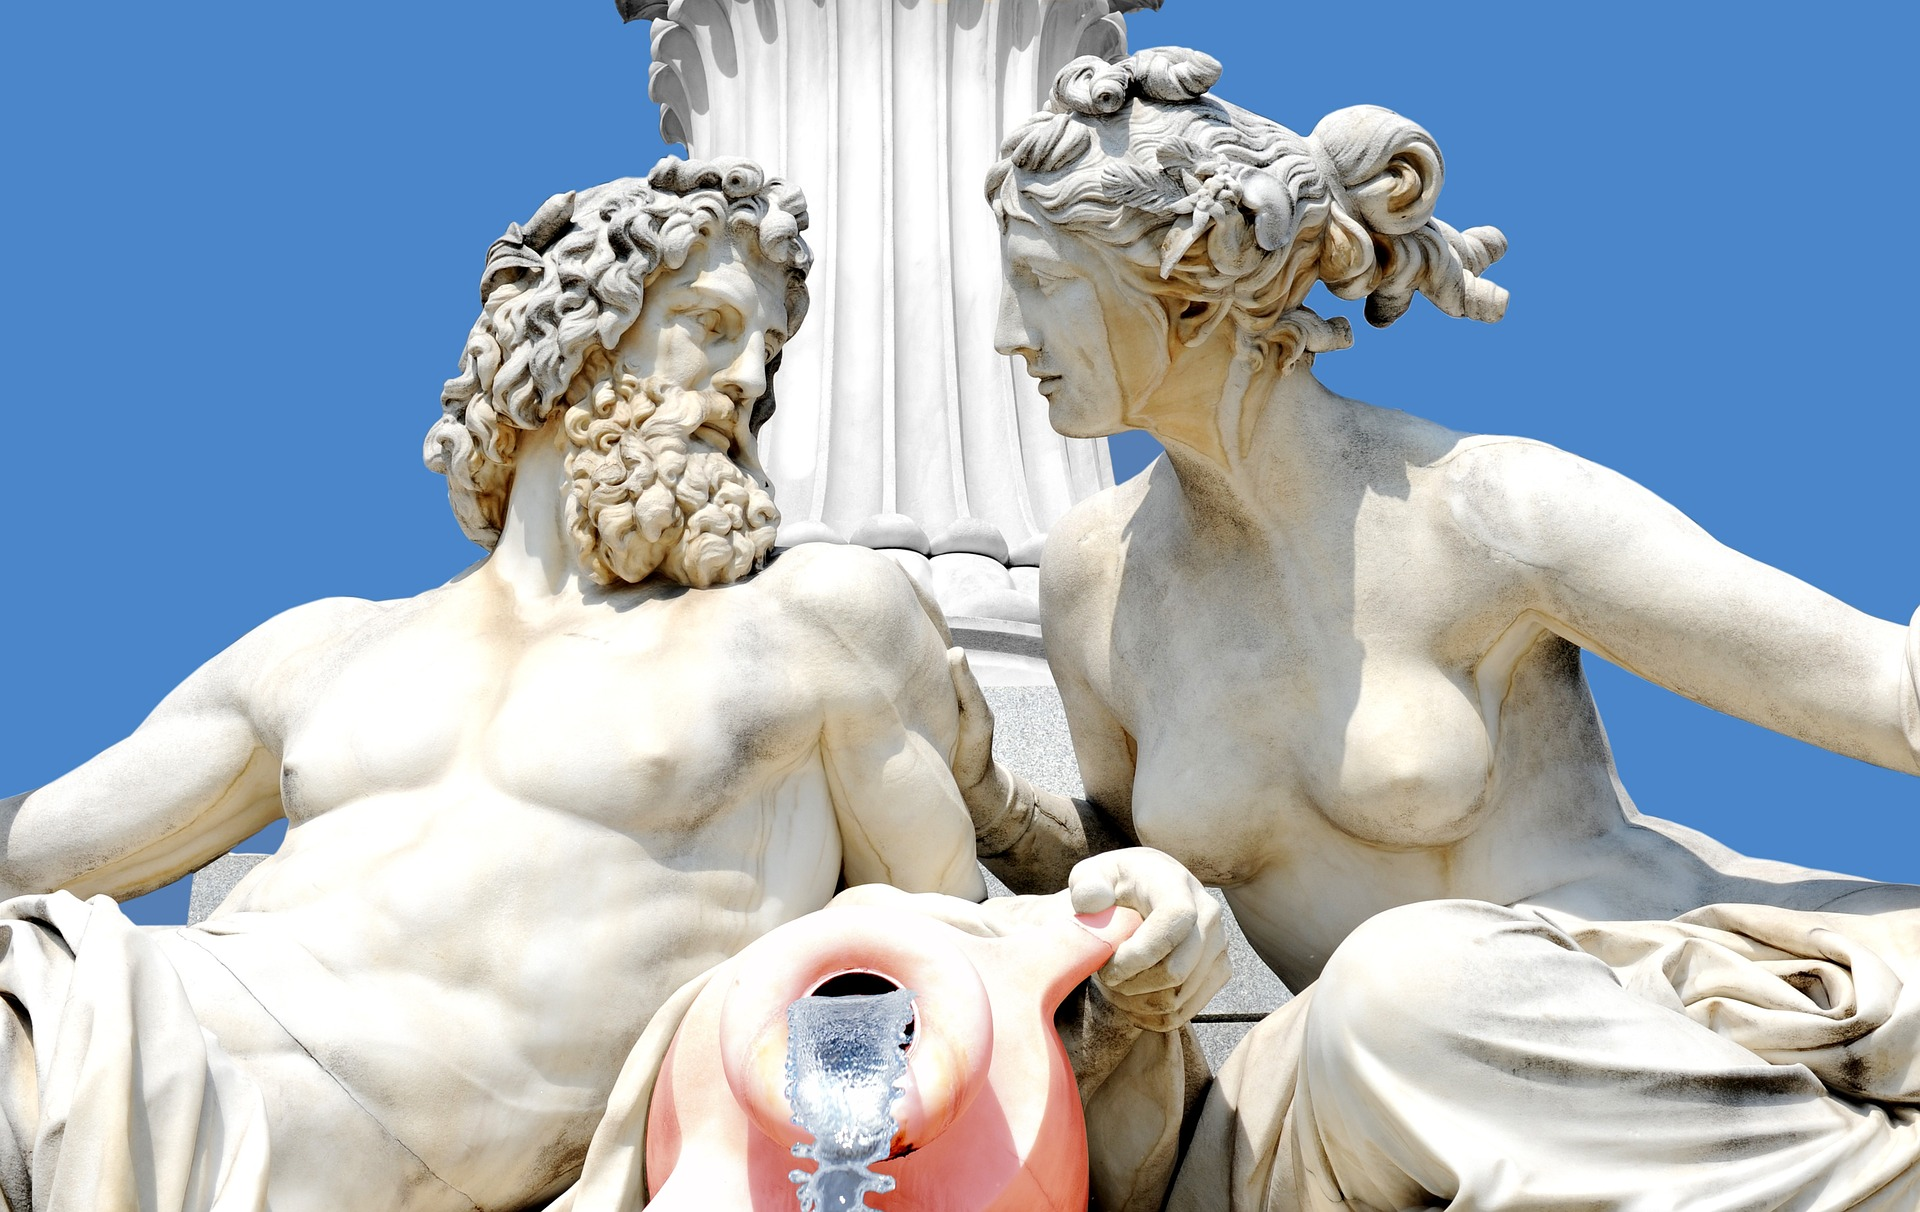 sculpture-1111260_1920